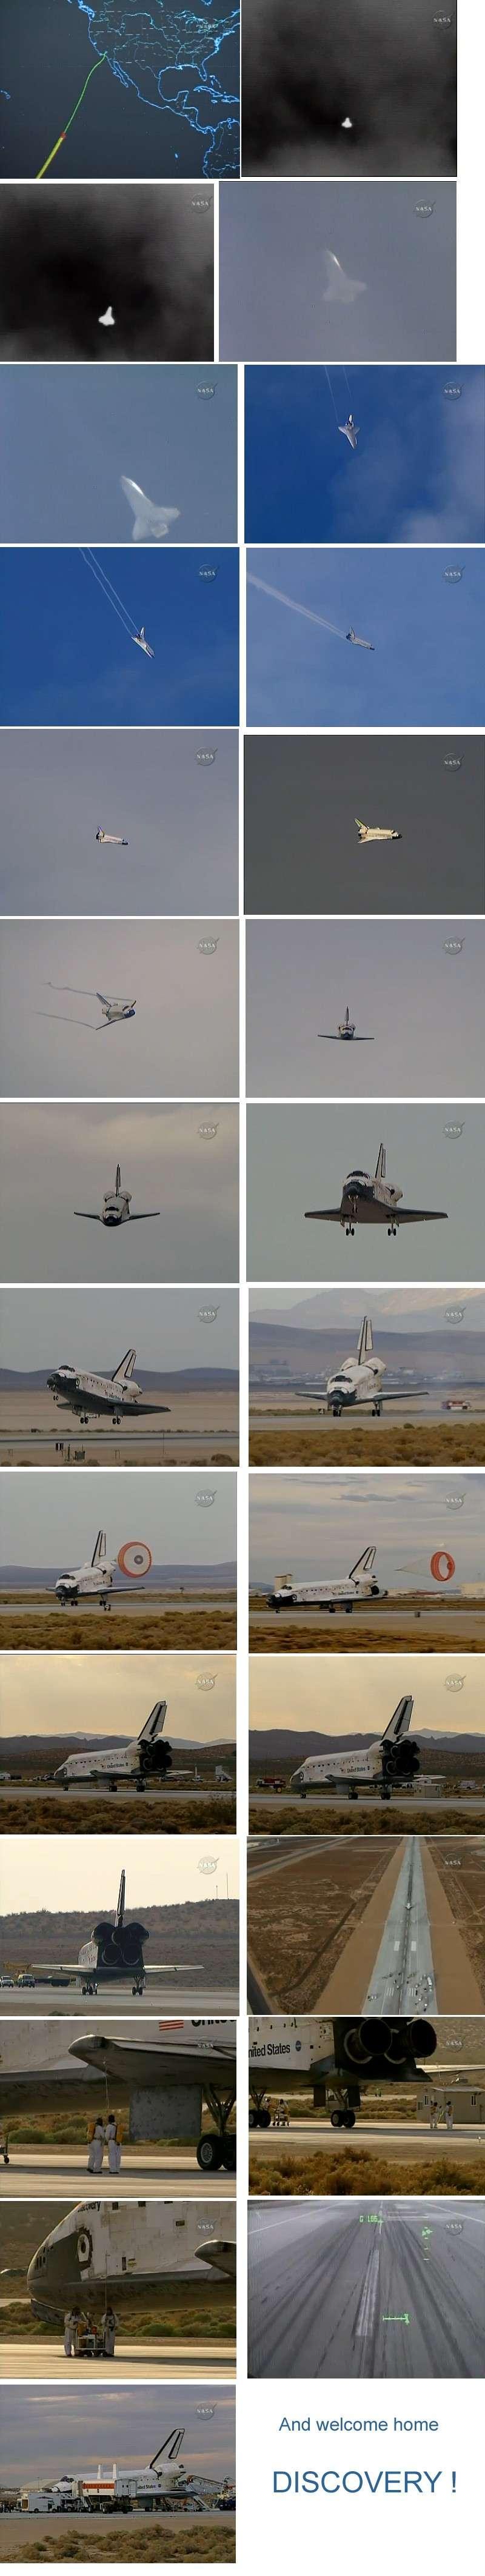 [STS-128] Discovery, retour sur Terre [Edwards] 11/09/2009 - Page 12 Reca10